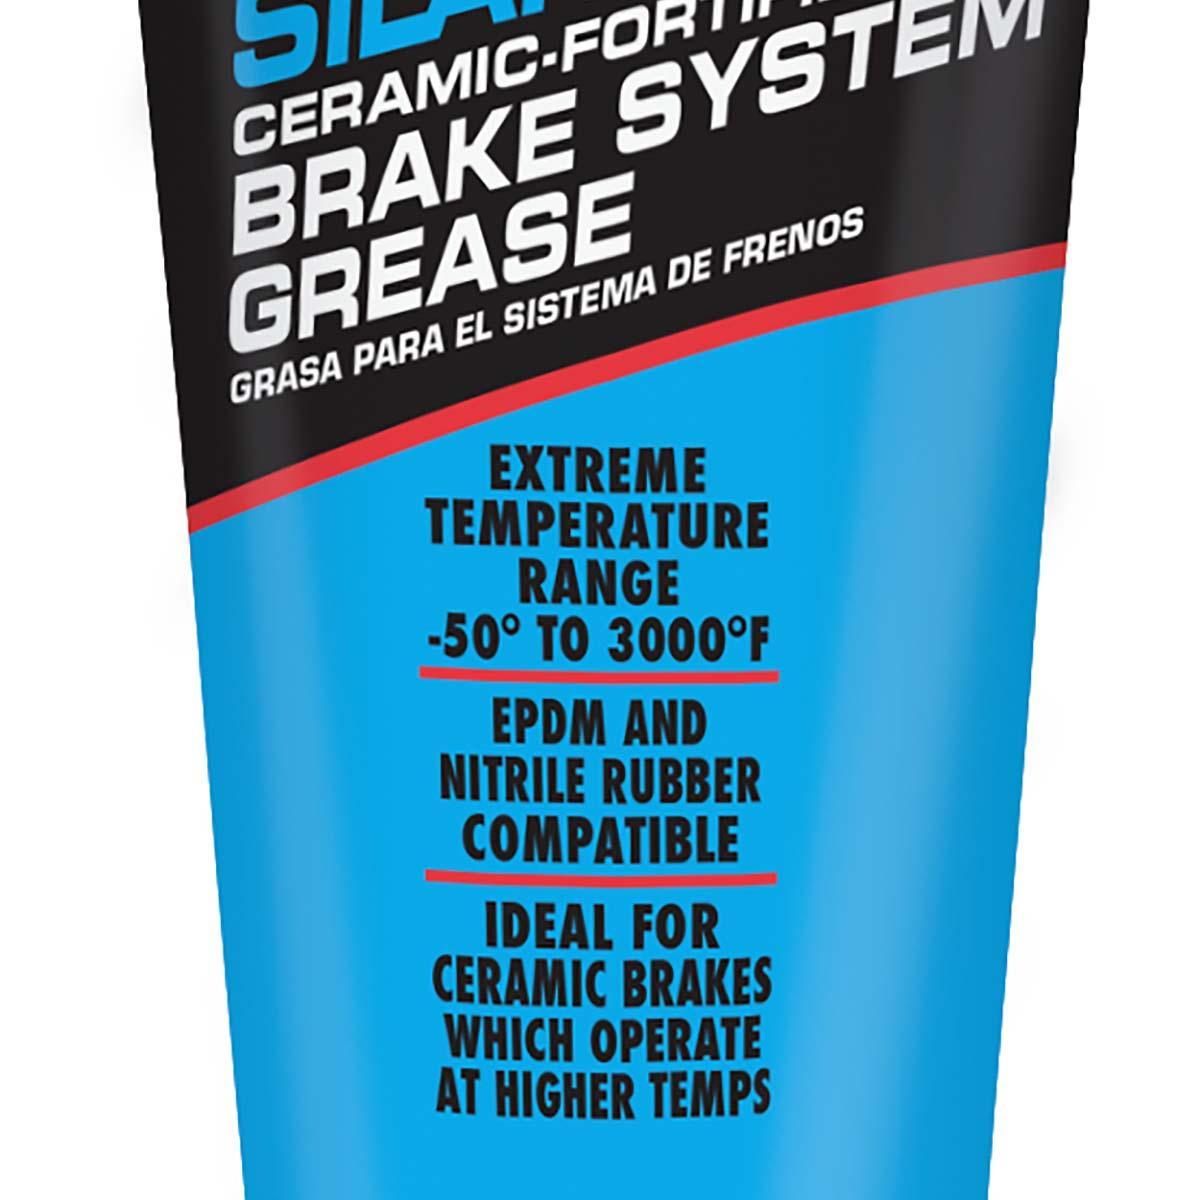 Silaramic® Brake System Grease, 5 Wt Oz